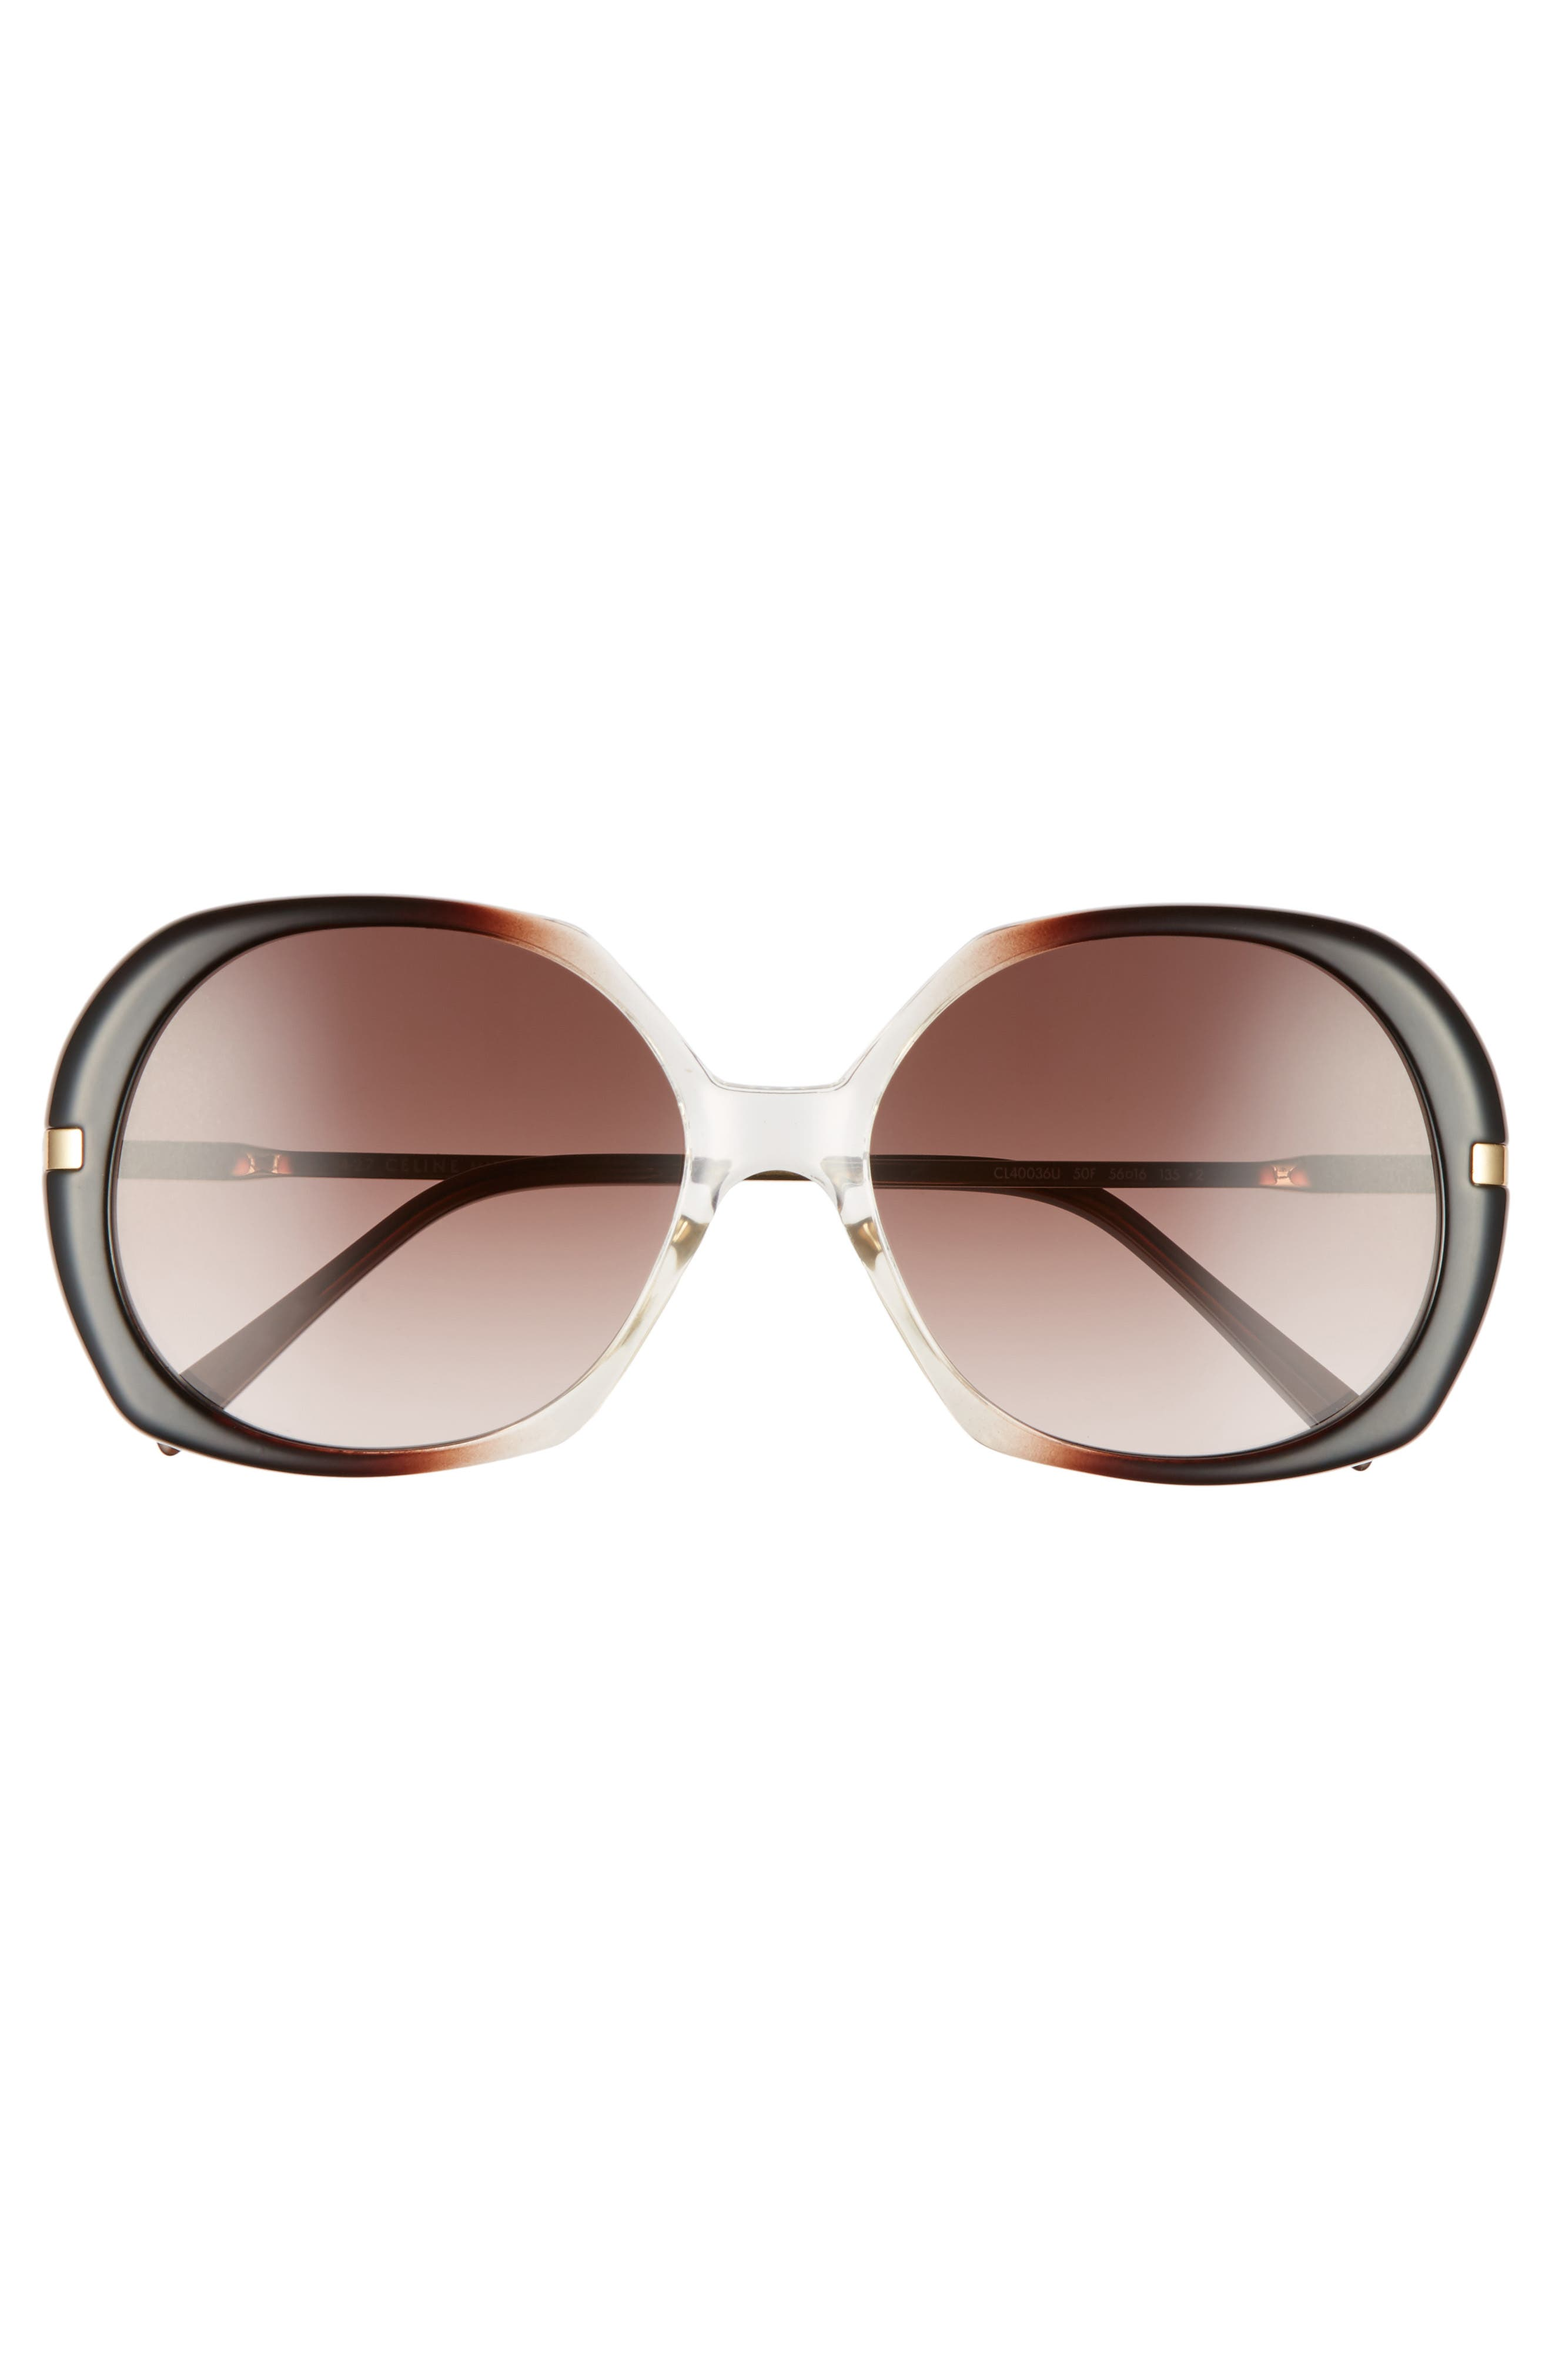 56mm Round Sunglasses,                             Alternate thumbnail 3, color,                             Dark Brown/ Light Gold/ Brown